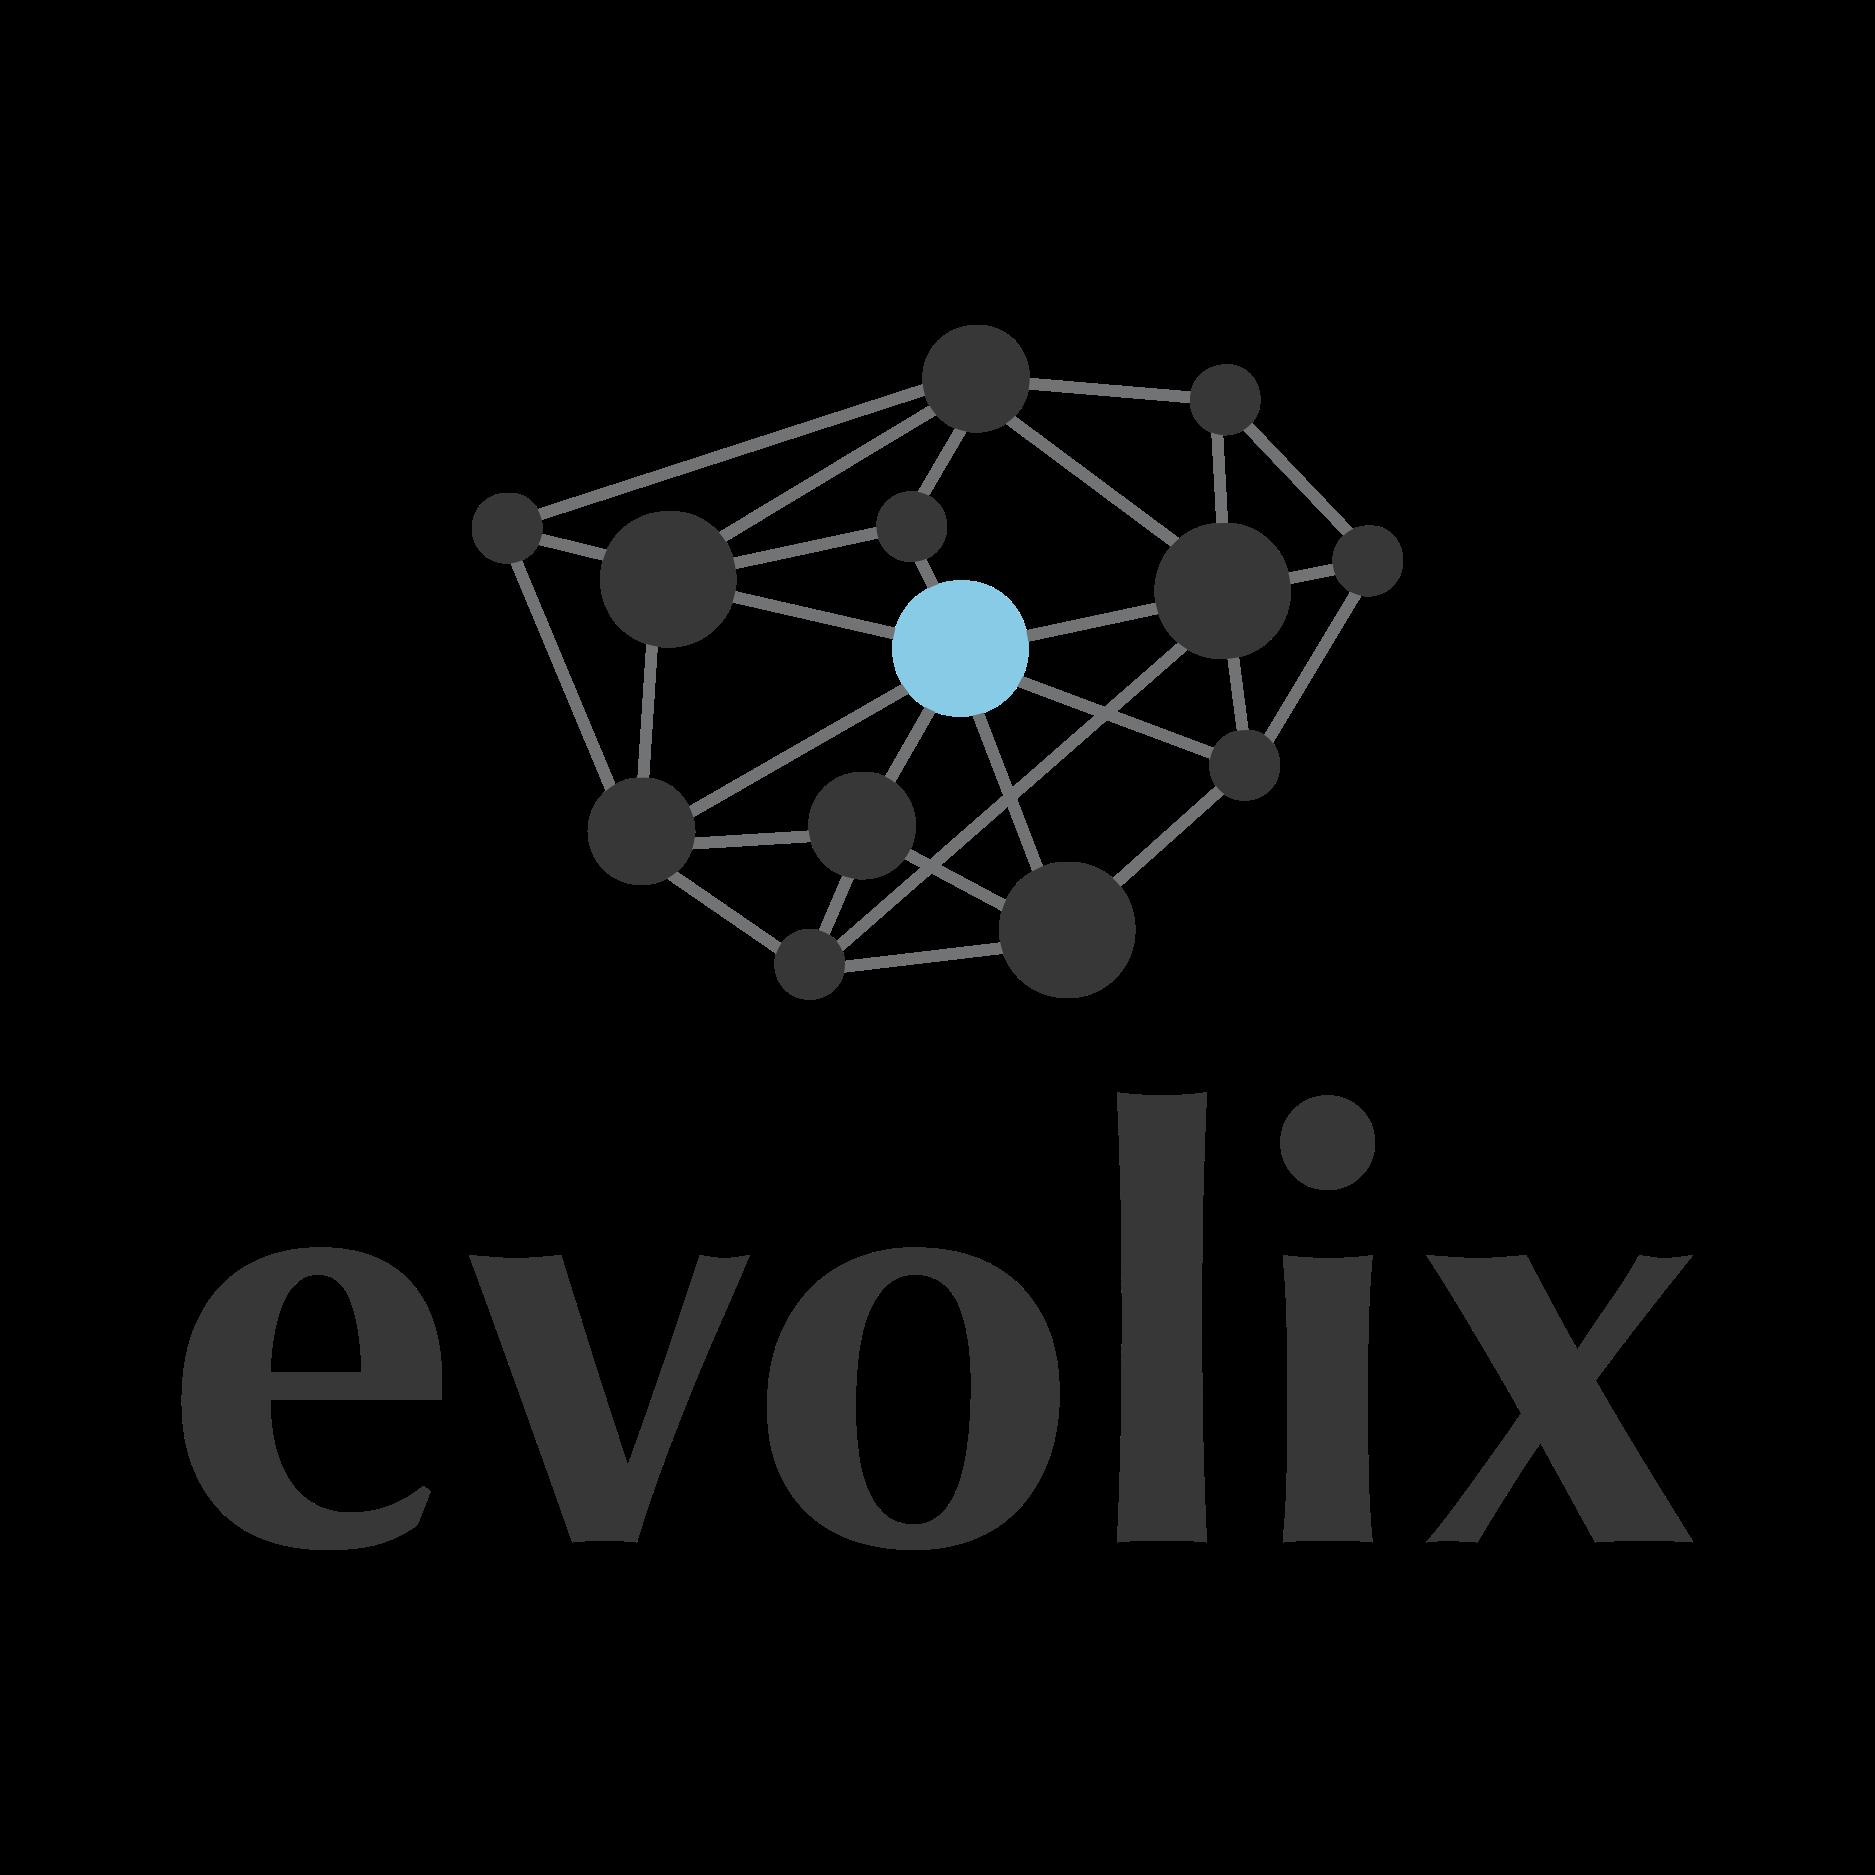 Wiki Evolix - Howto Rsyslog